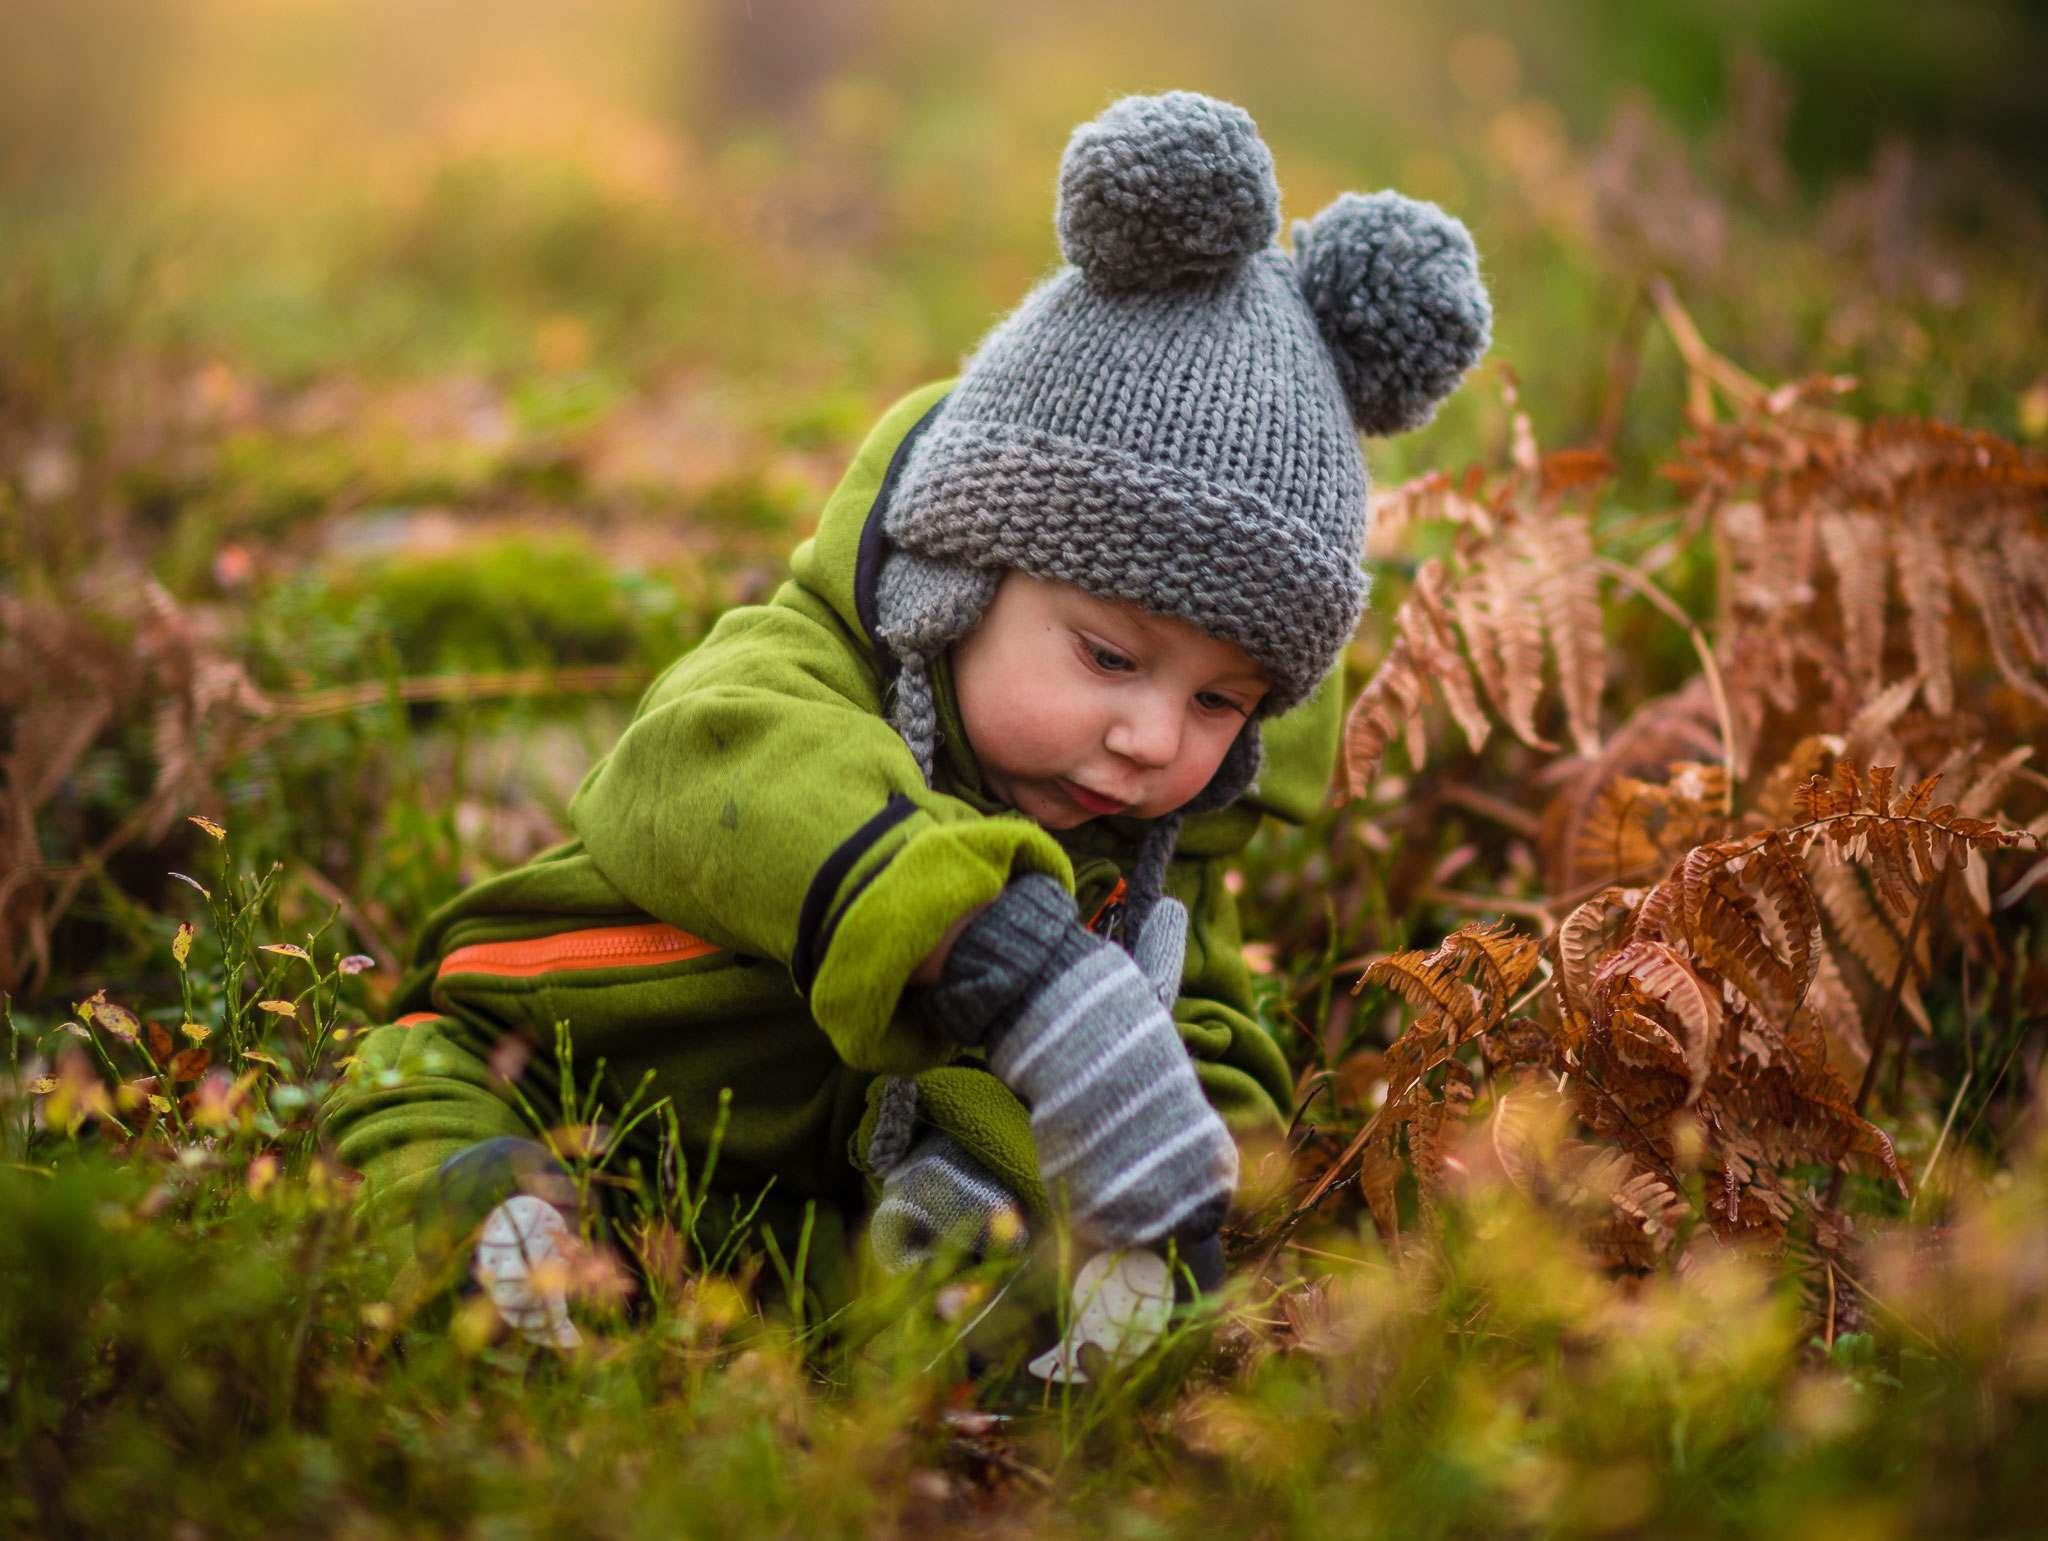 Inspiring Children in Wildlife